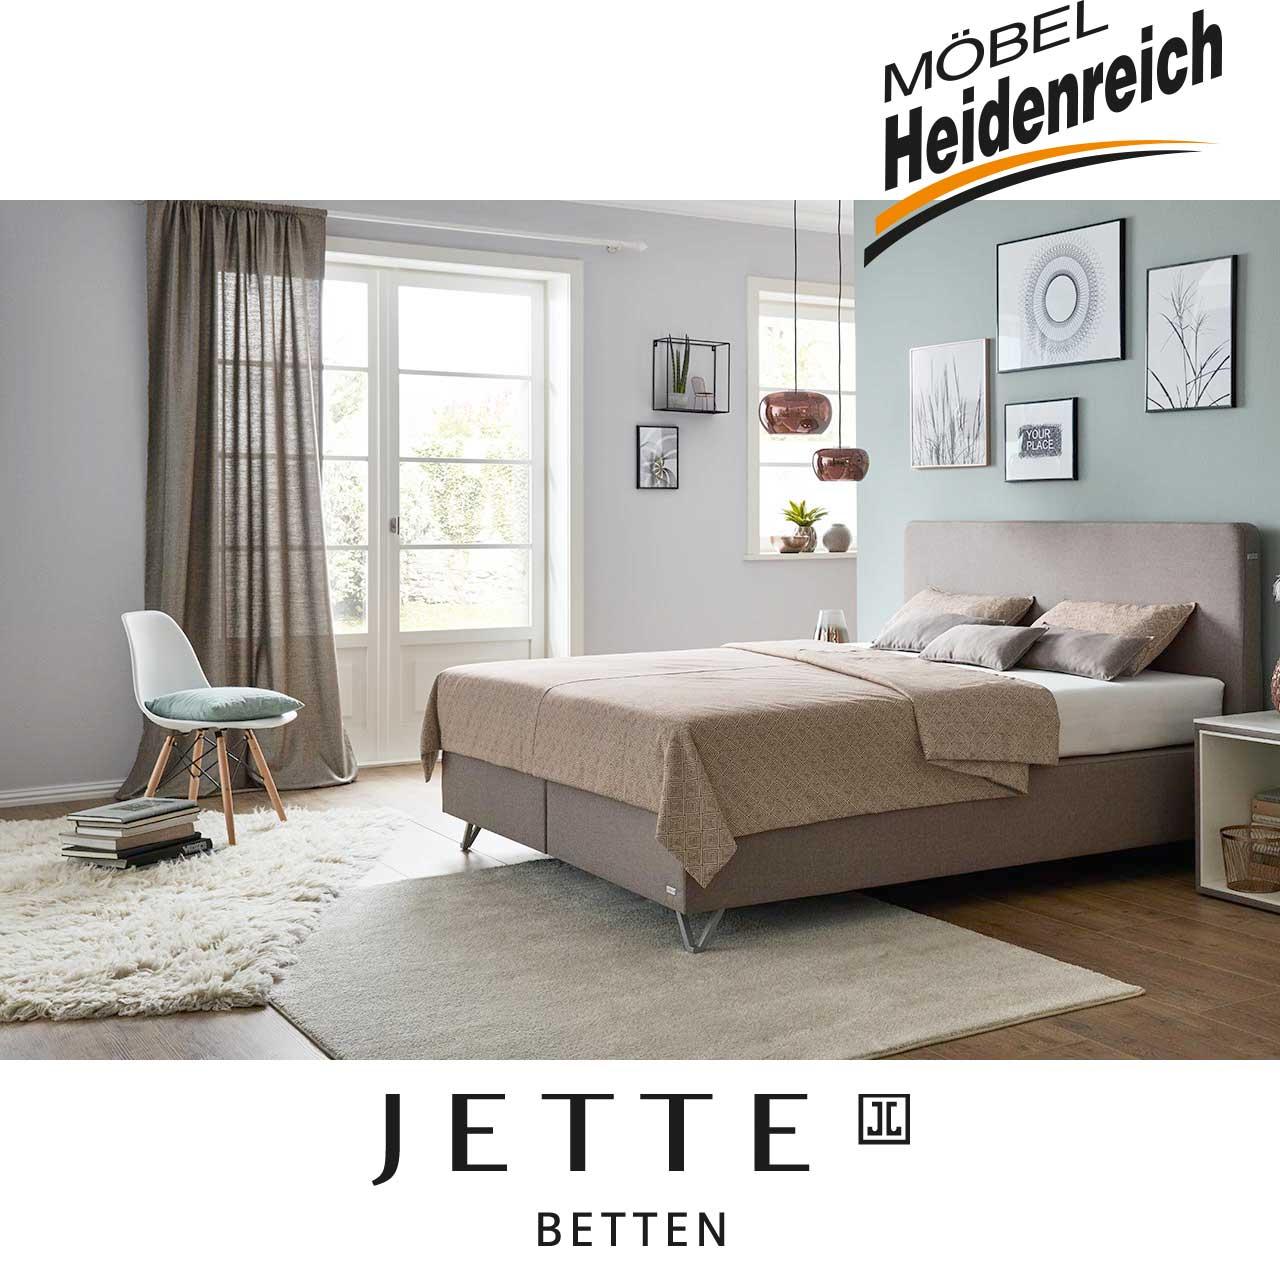 Jette Betten Polsterbett Bettkasten 101